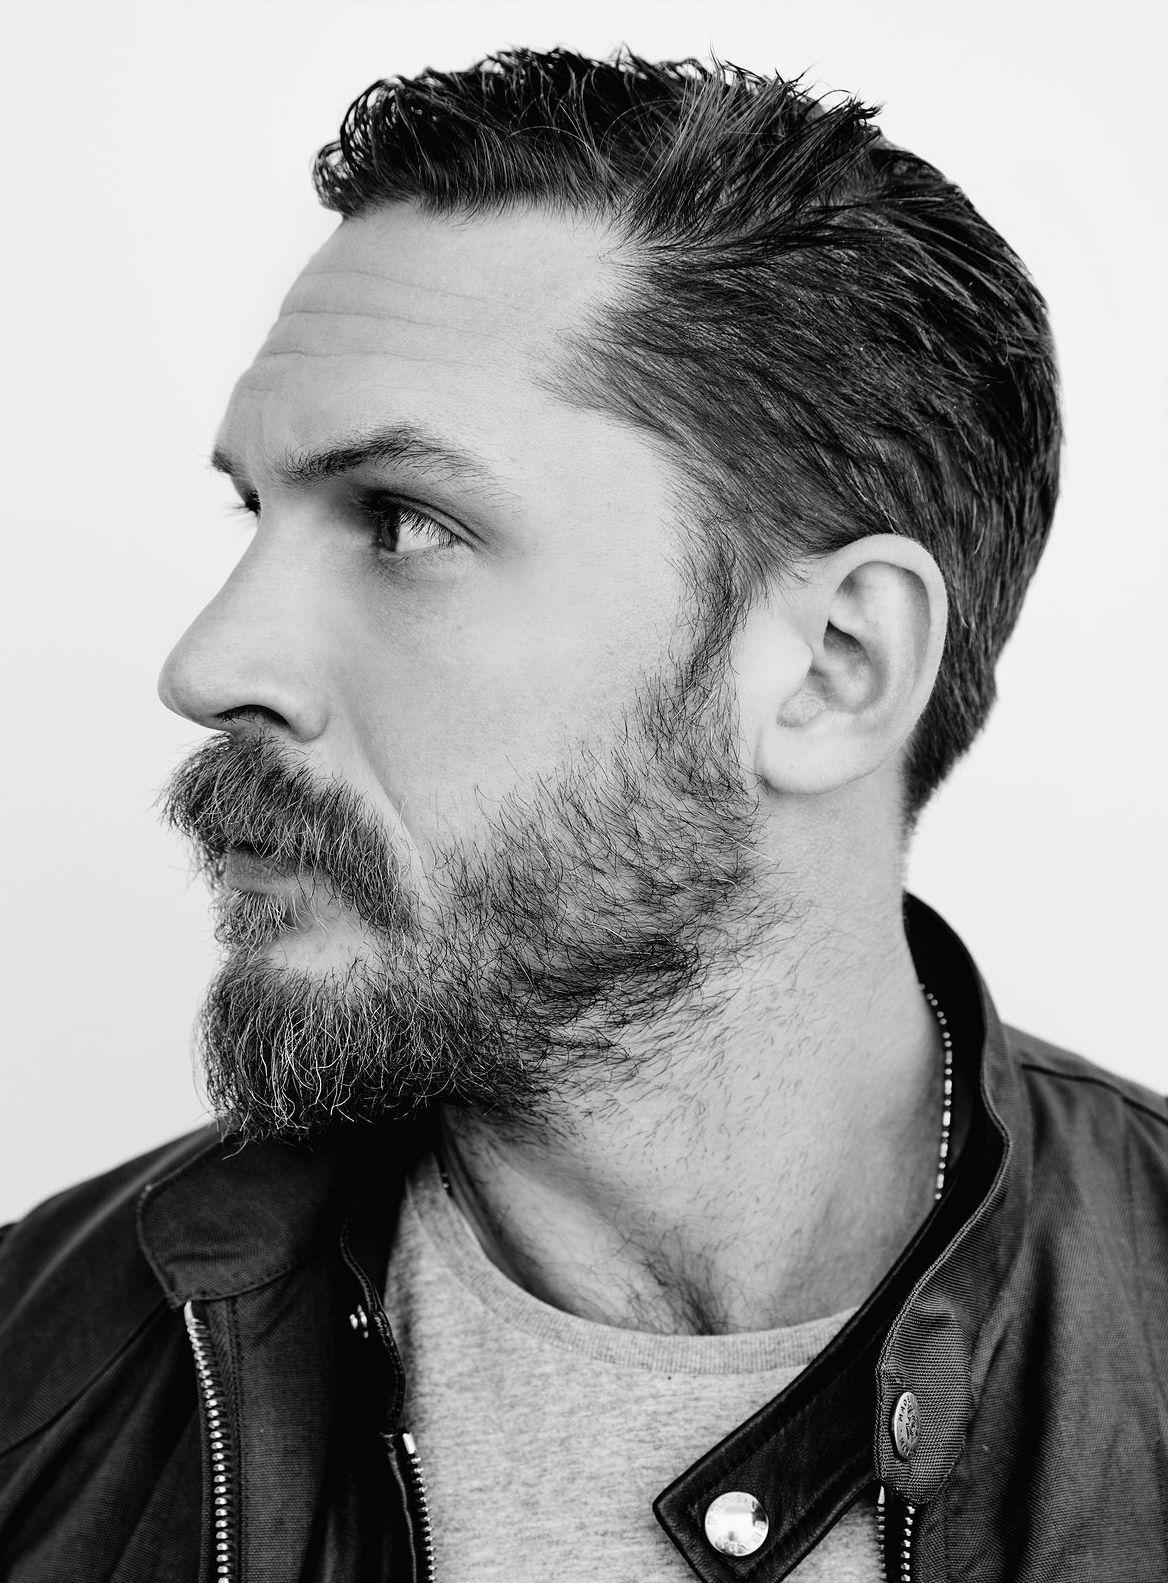 Tom Hardy Png Pesquisa Google Tom Hardy Beard Tom Hardy Haircut Tom Hardy